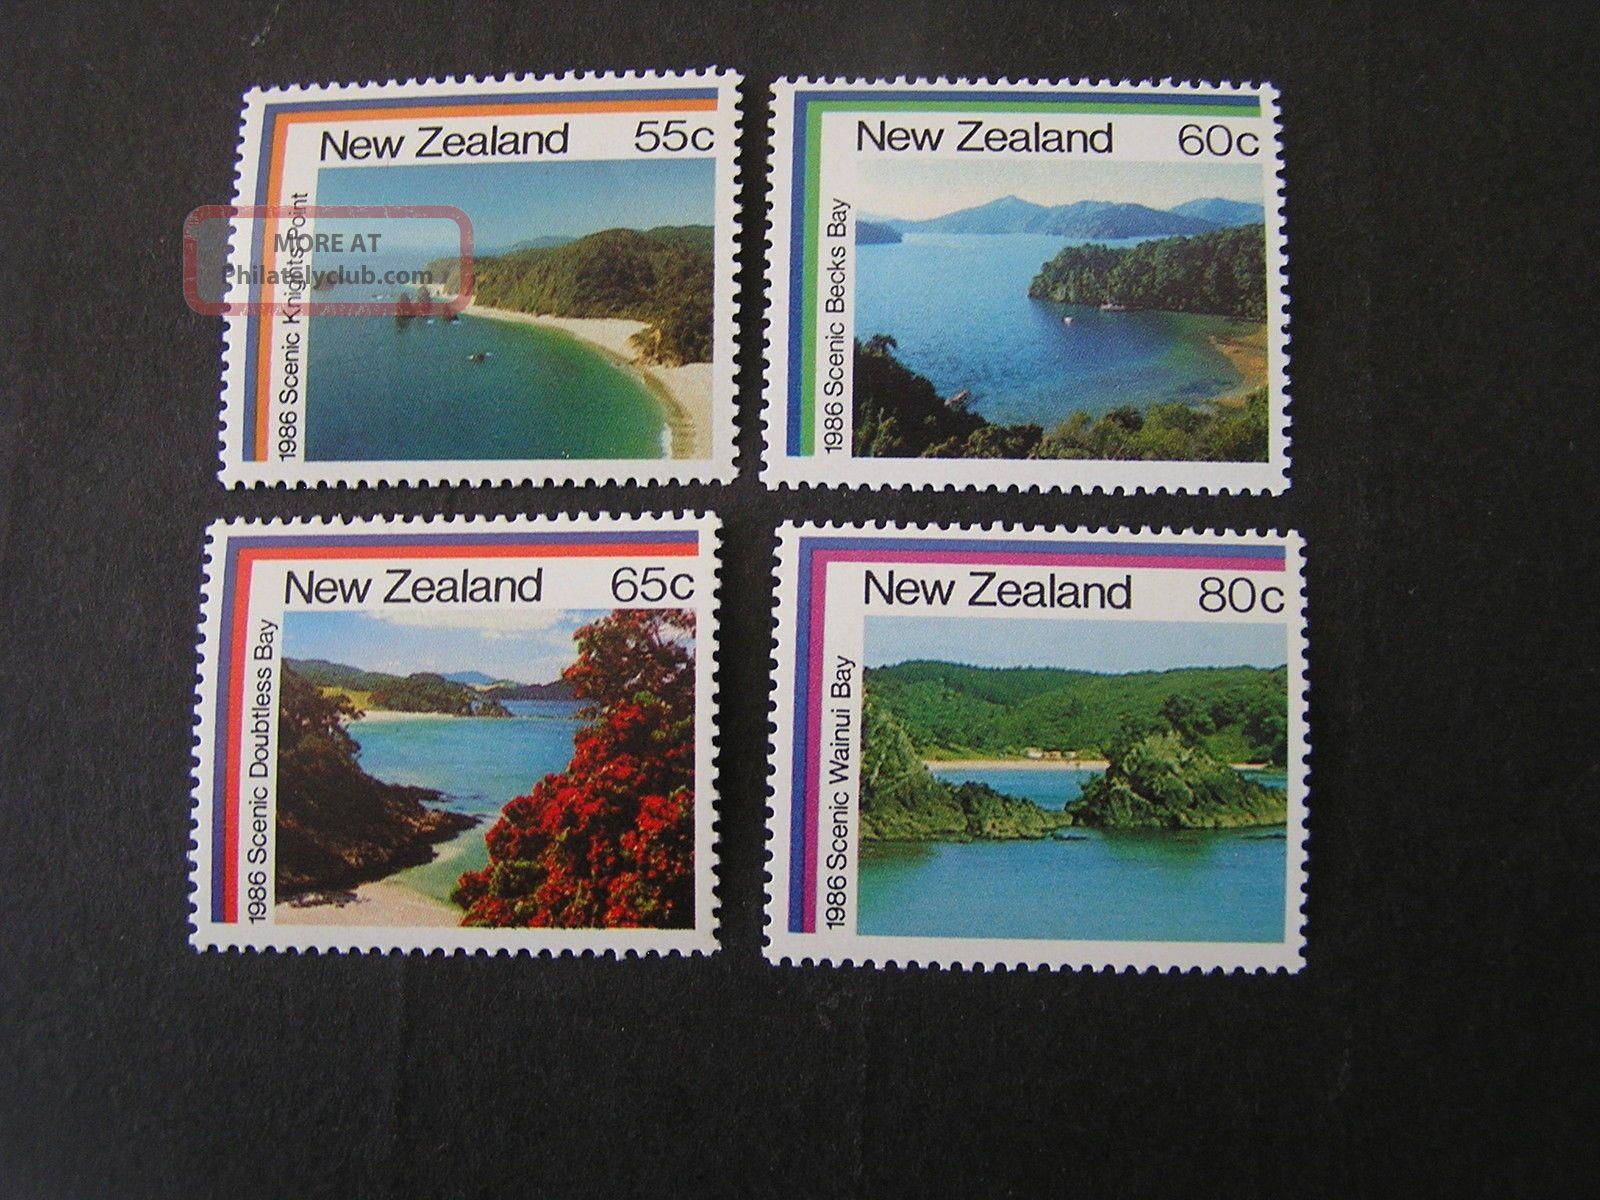 Zealand,  Scott 850 - 853 (4) Local Scenes 1986 Issue. Australia & Oceania photo